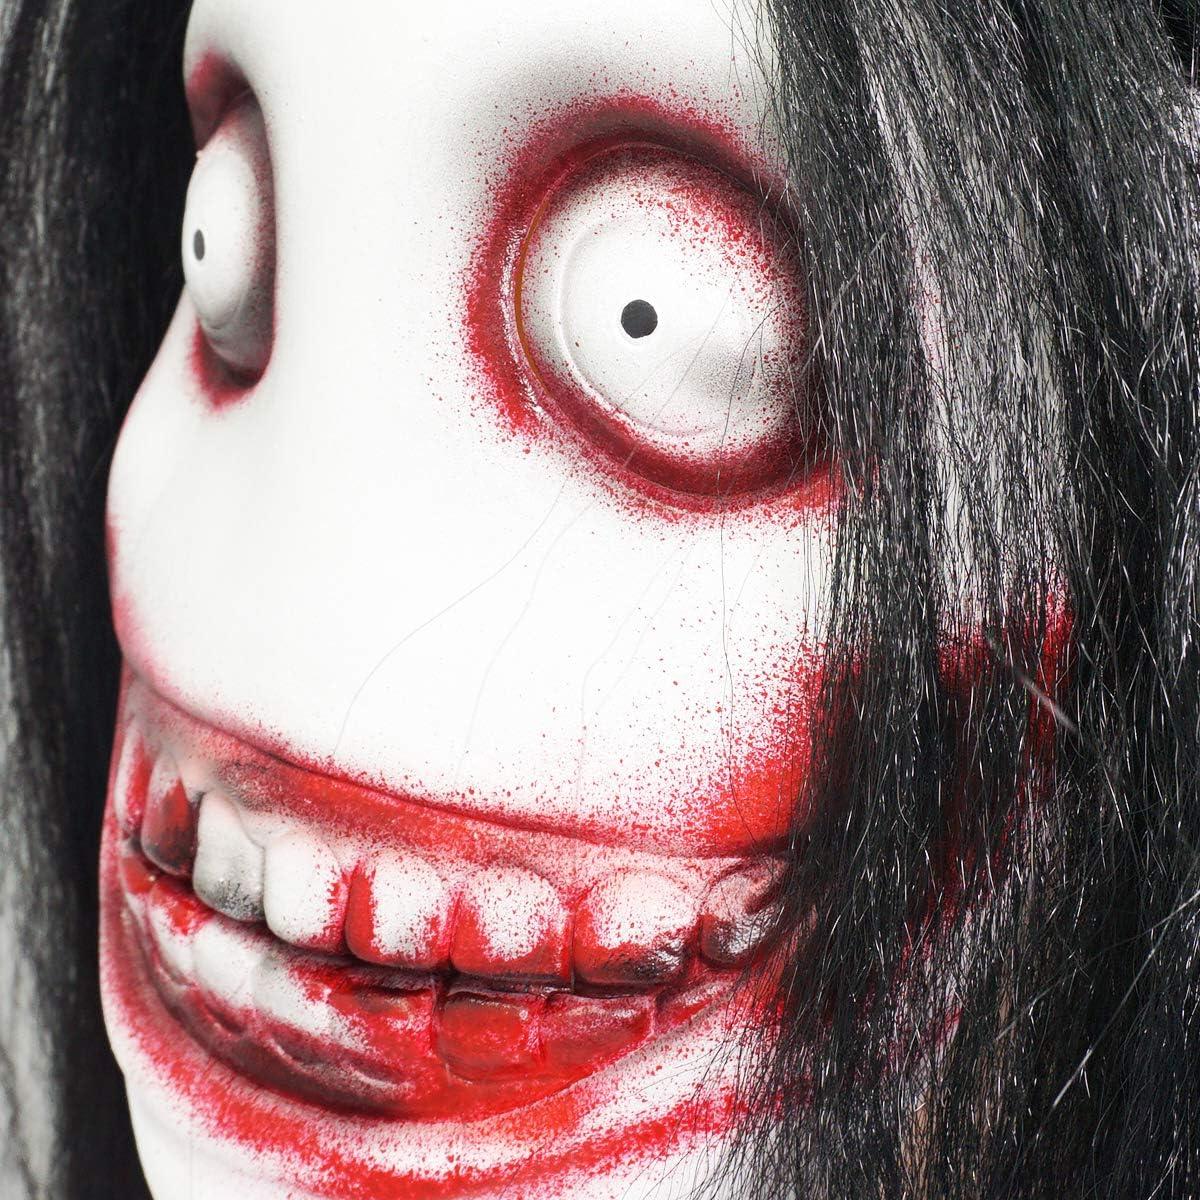 MISS C Máscara de látex Jeff The Killer para Halloween, Cosplay ...